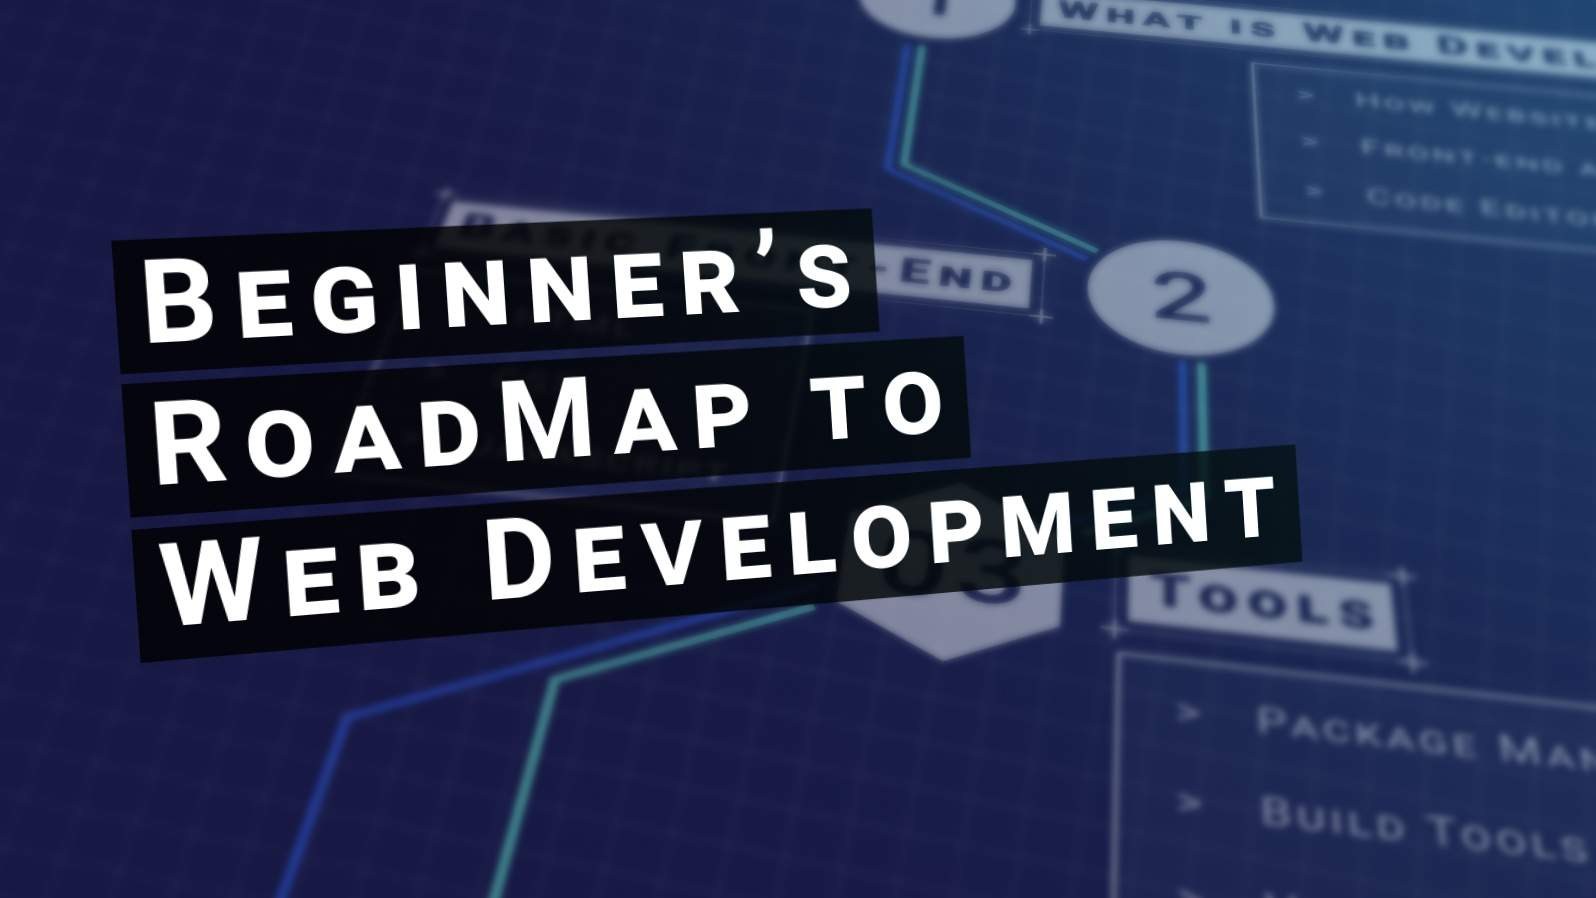 Beginner S Roadmap To Web Development